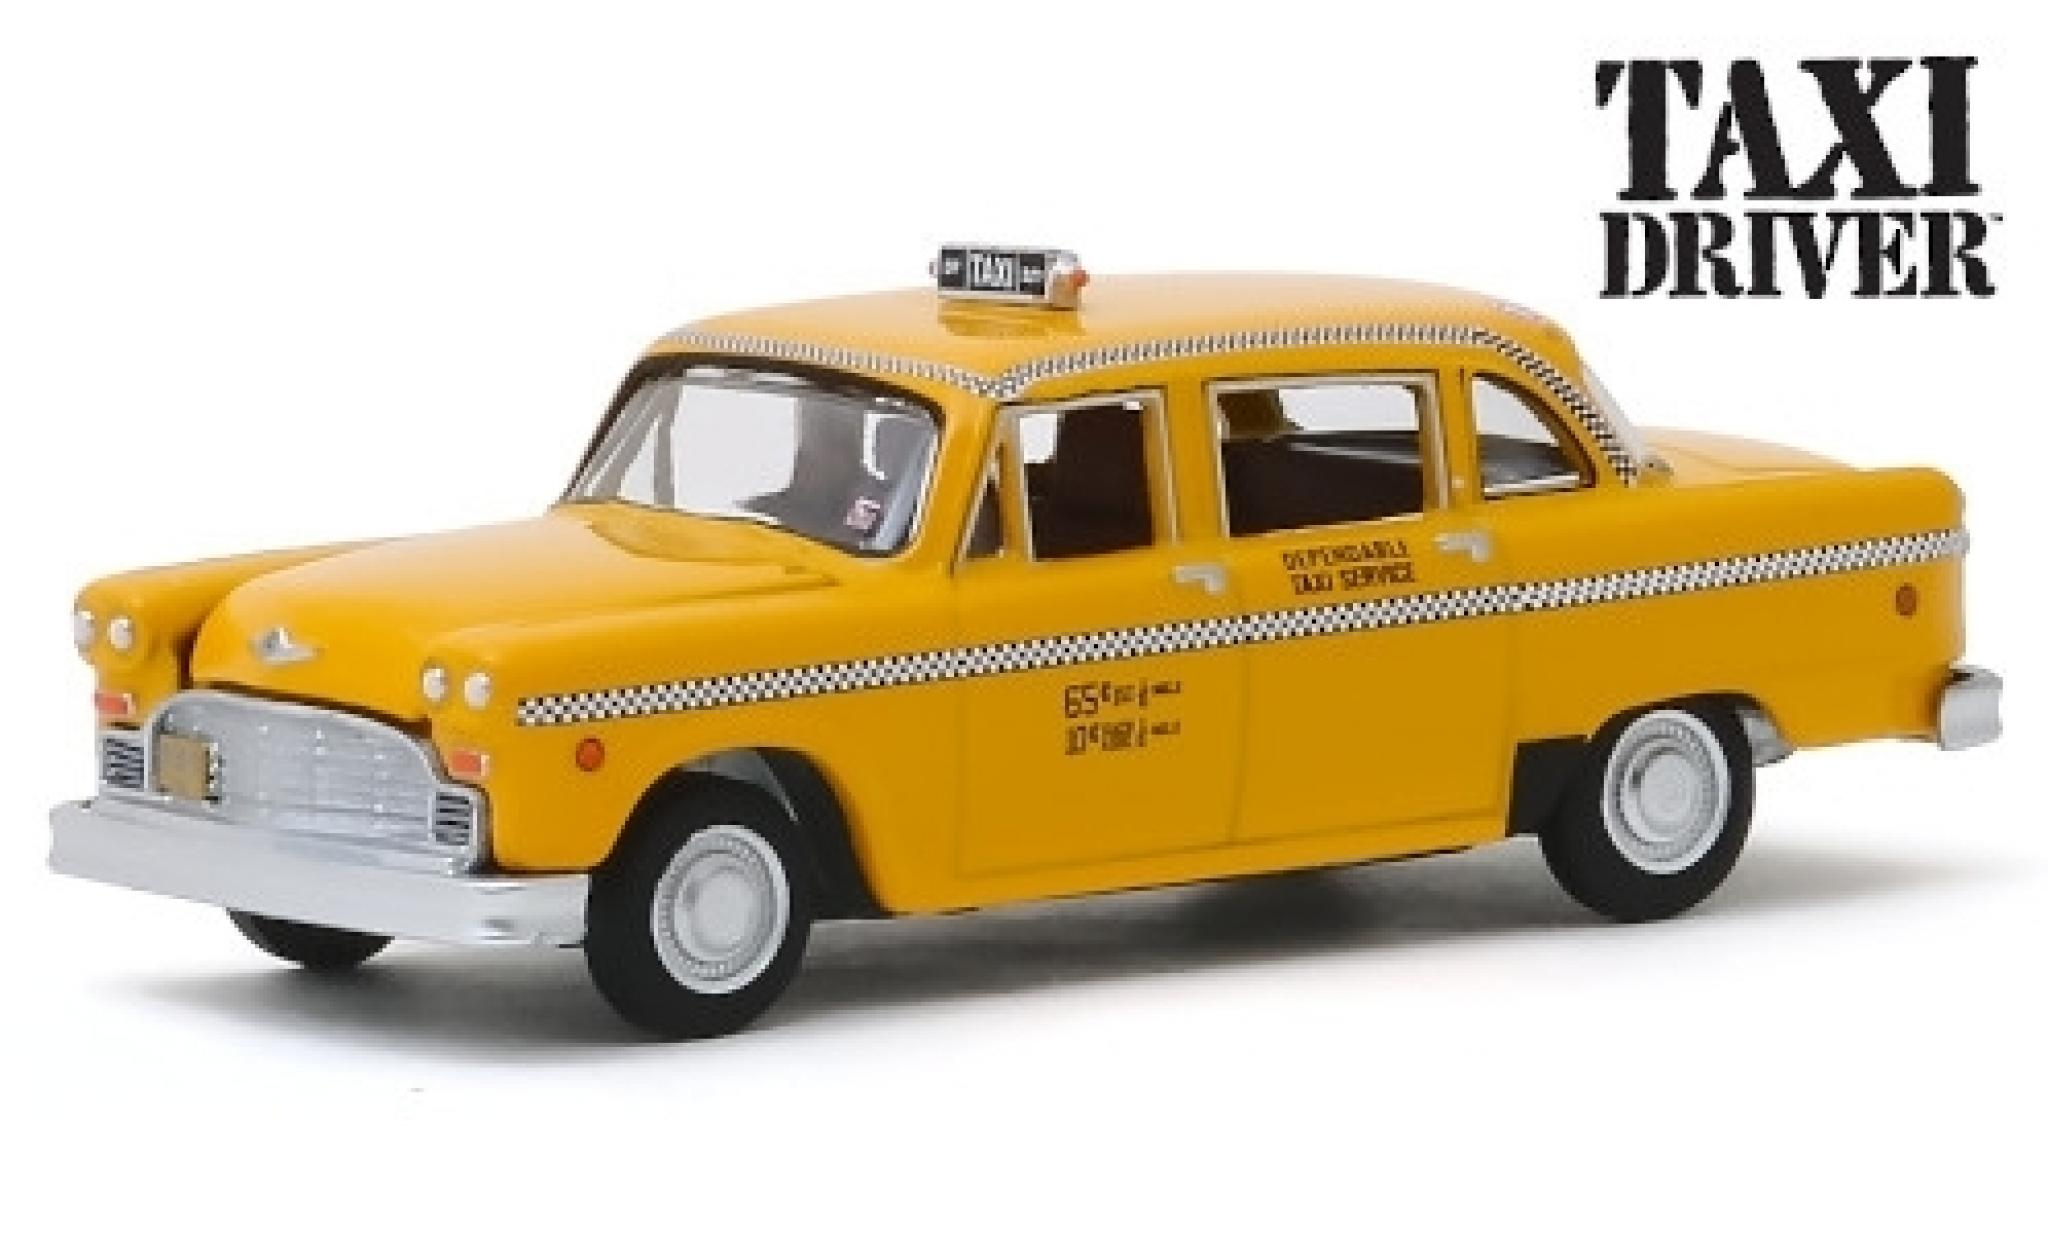 Checker Marathon 1/64 Greenlight Taxi Cab yellow/Dekor Taxi Driver 1975